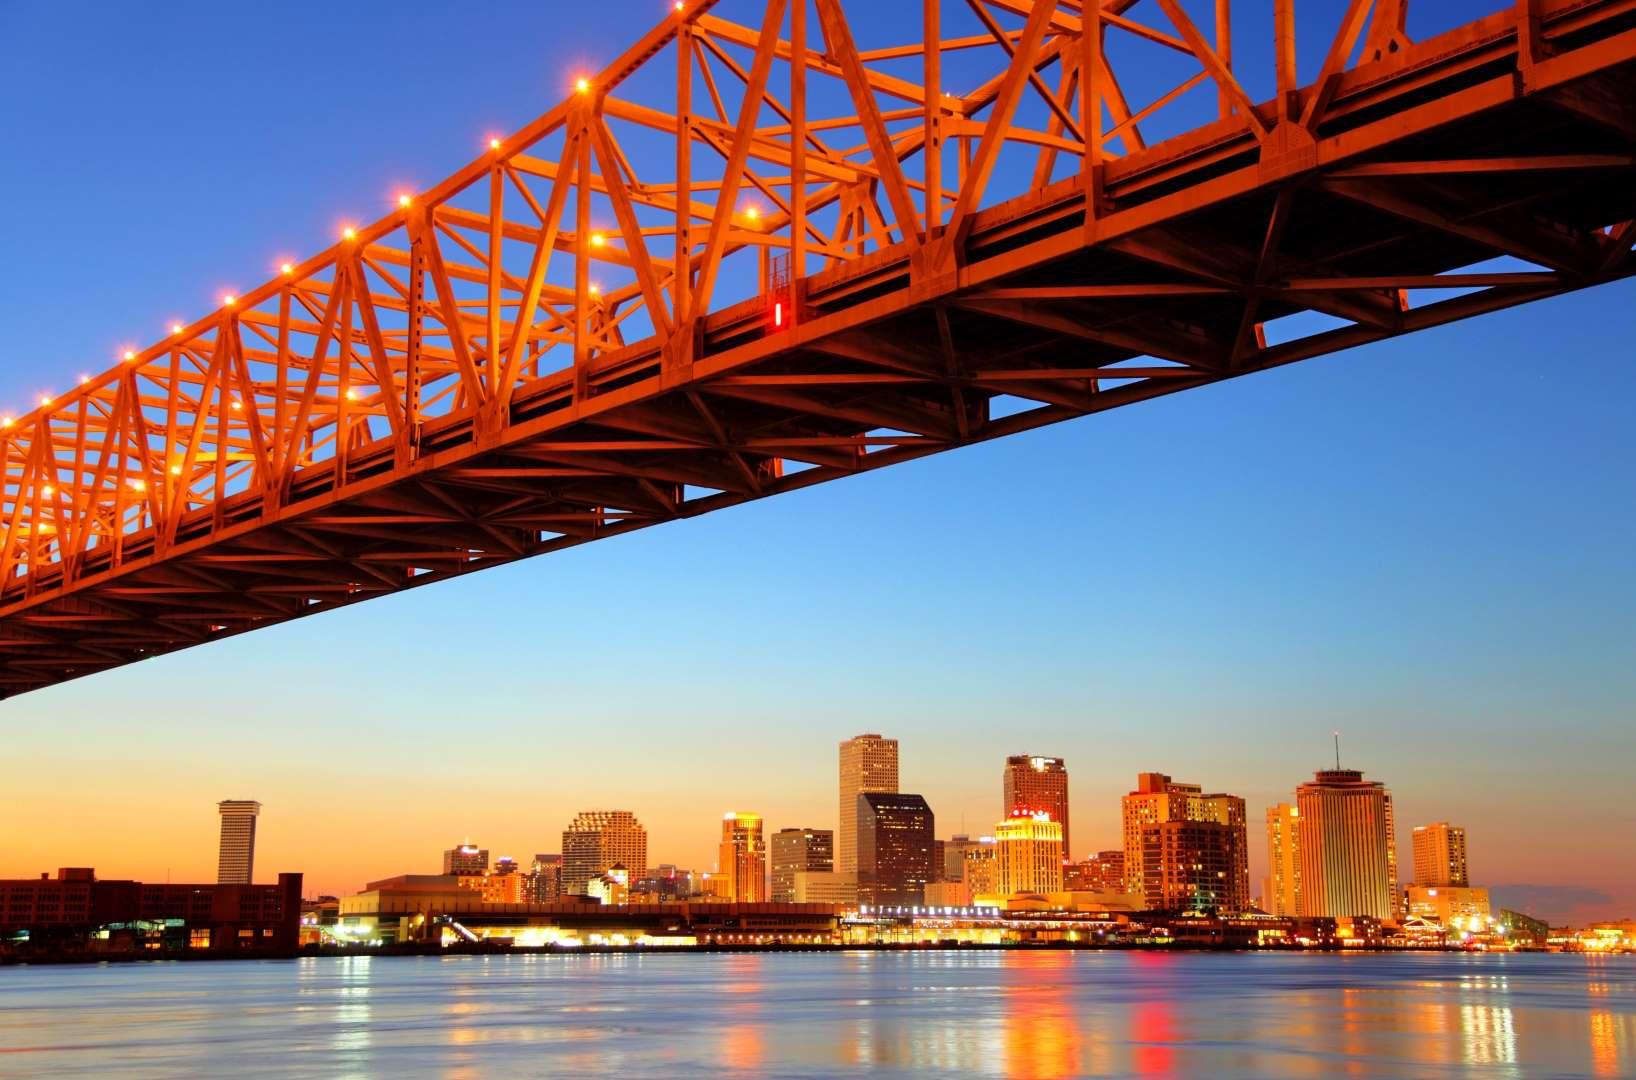 New Orleans, Luisiana (USA)